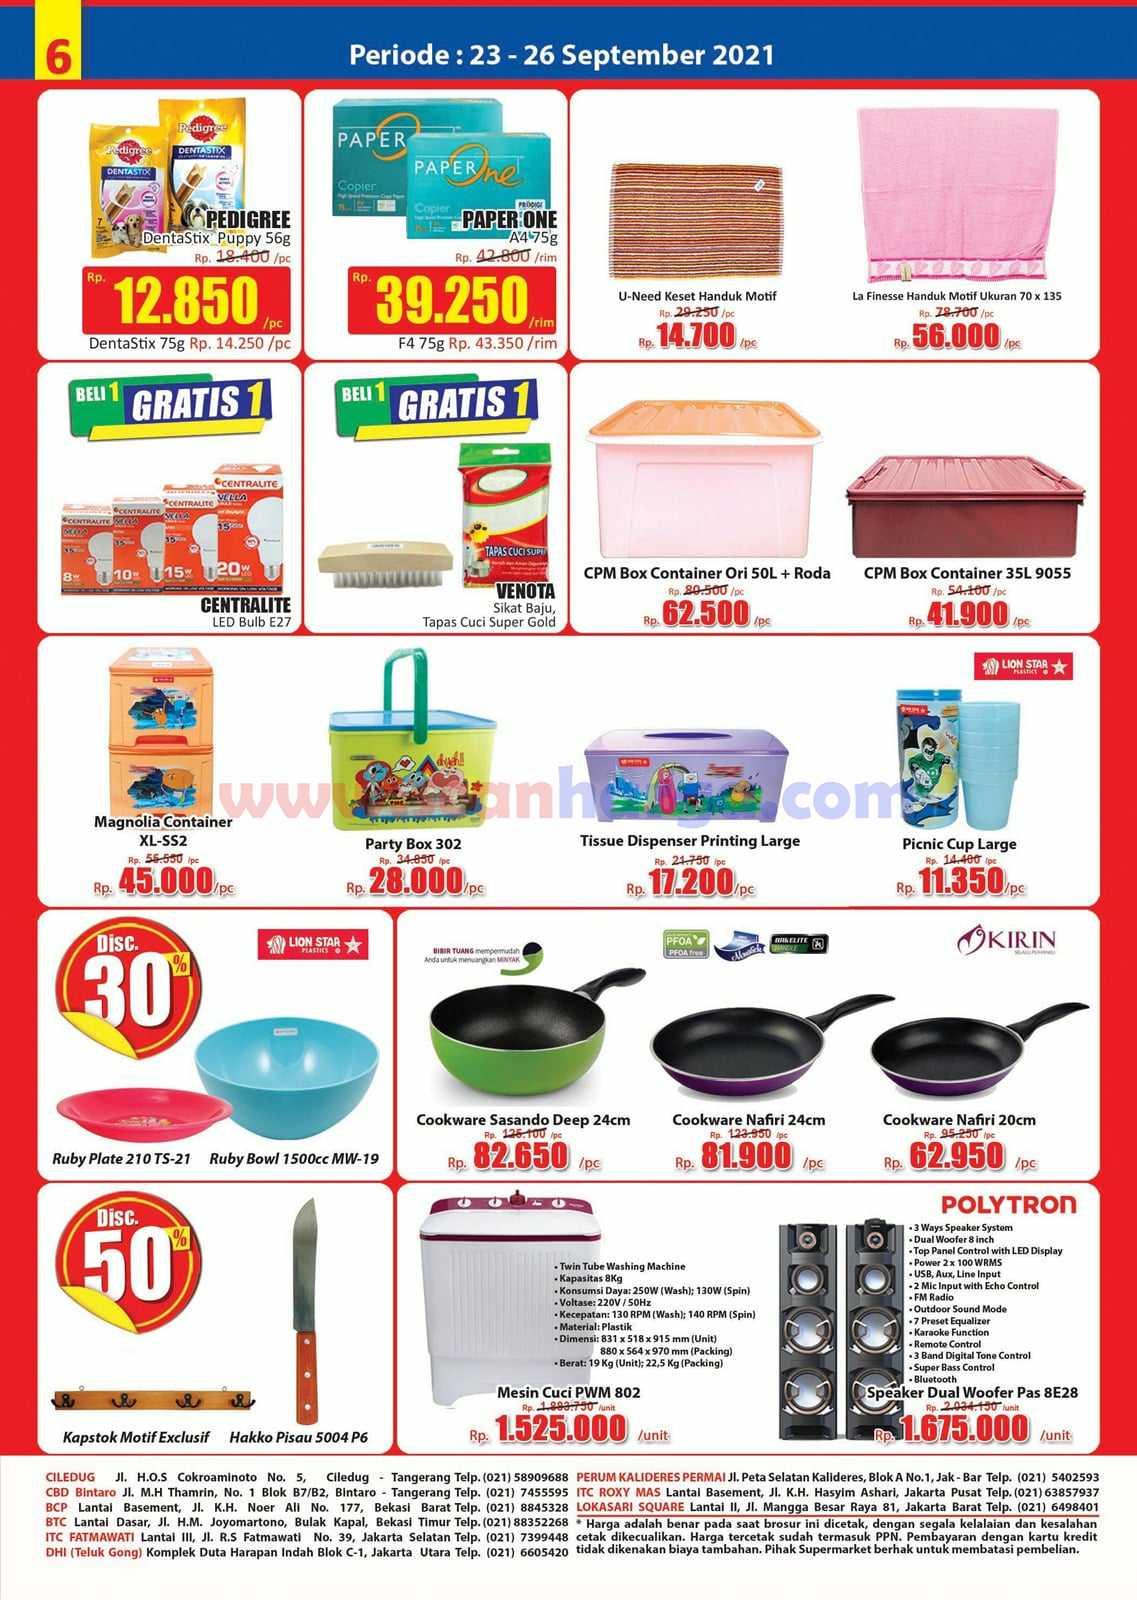 Katalog Promo JSM Hari Hari Swalayan Weekend 23 - 26 September 2021 6